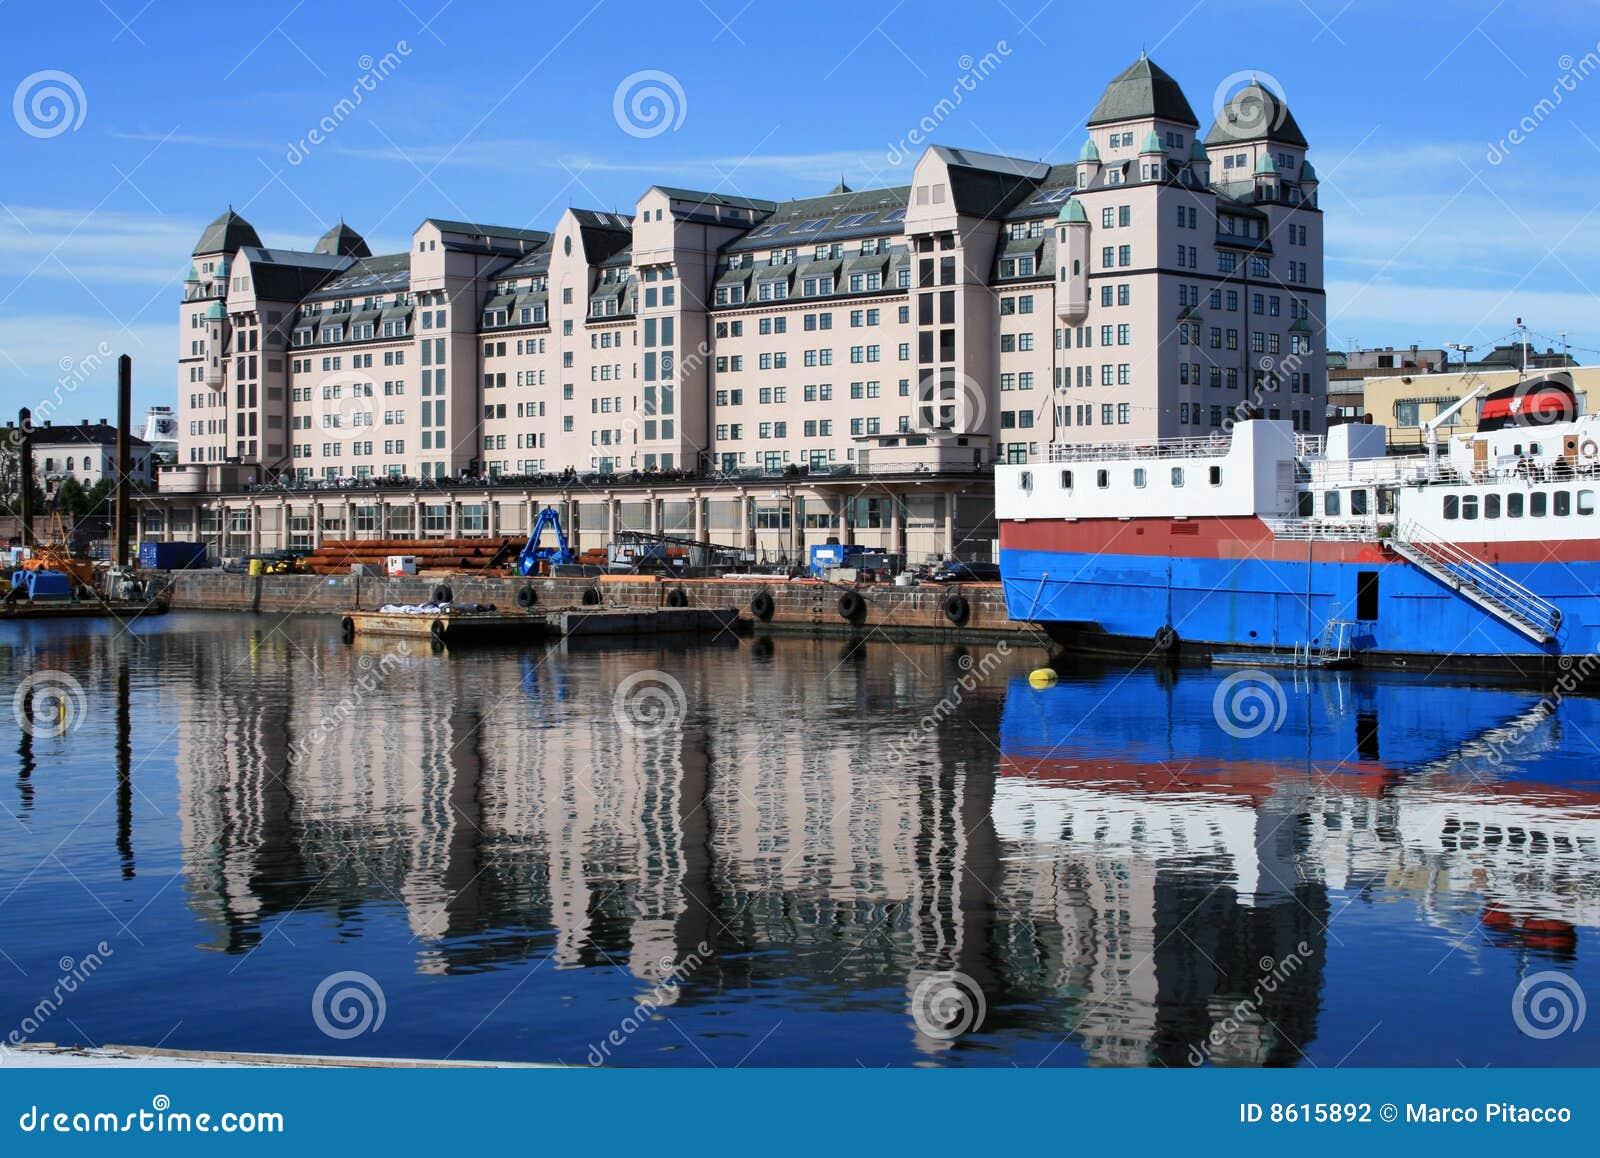 Port of Oslo